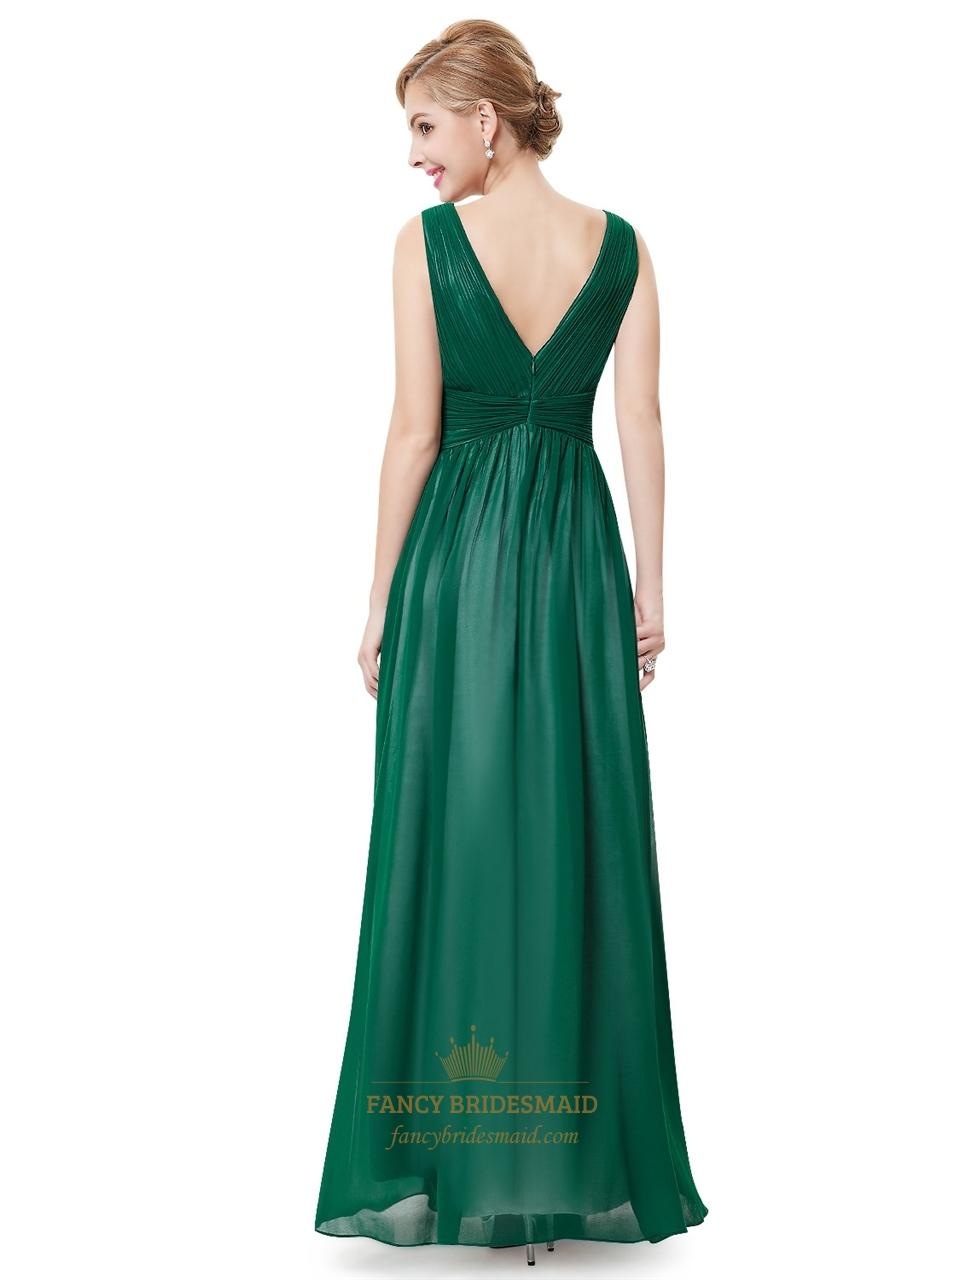 Elegant Emerald Green Sleeveless Chiffon Prom Dresses With ...